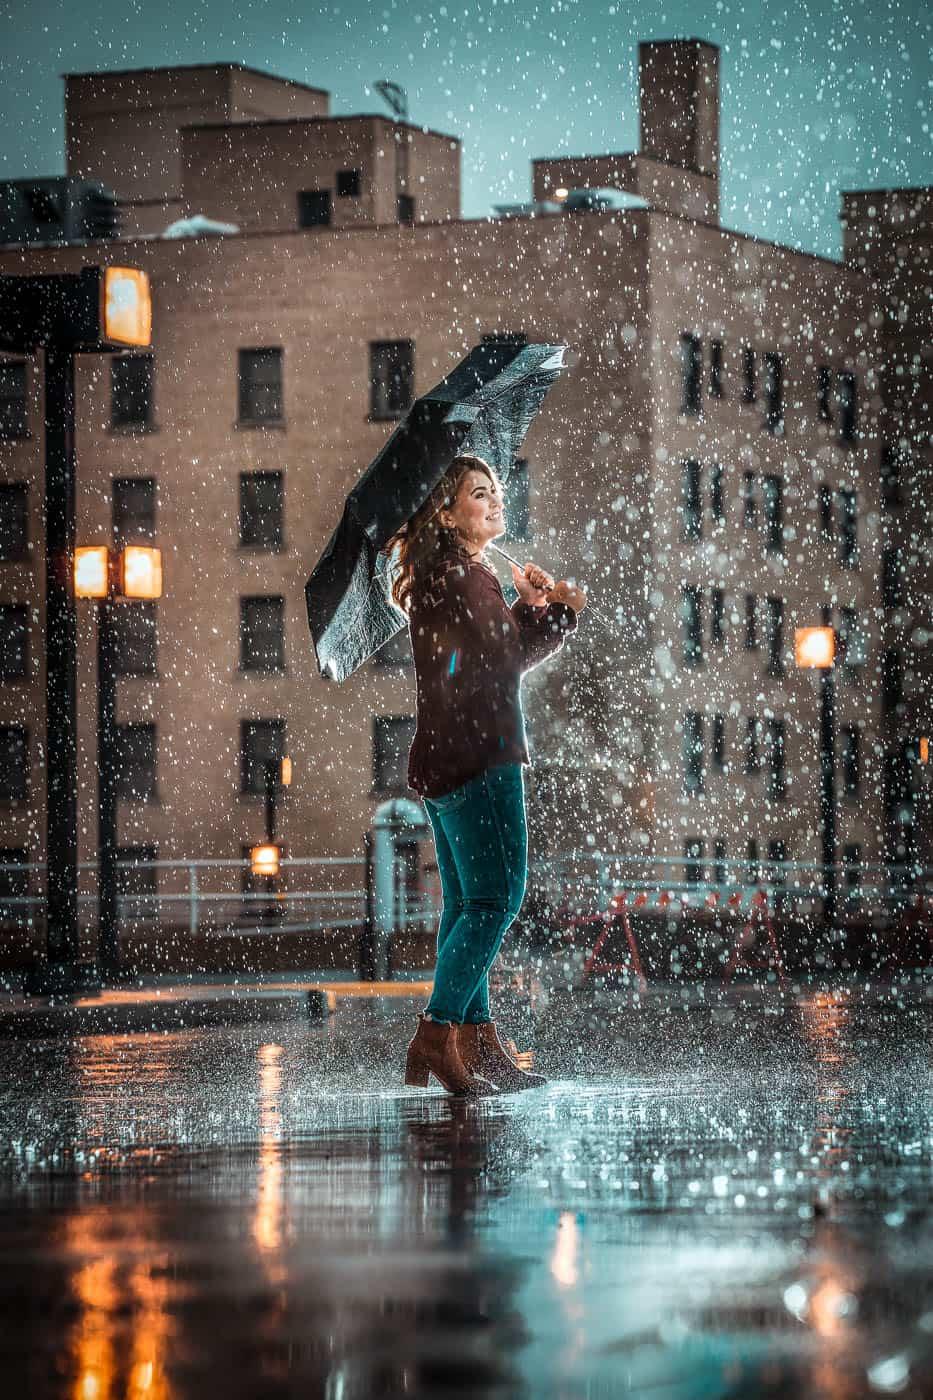 Senior girl in the rain with an umbrella